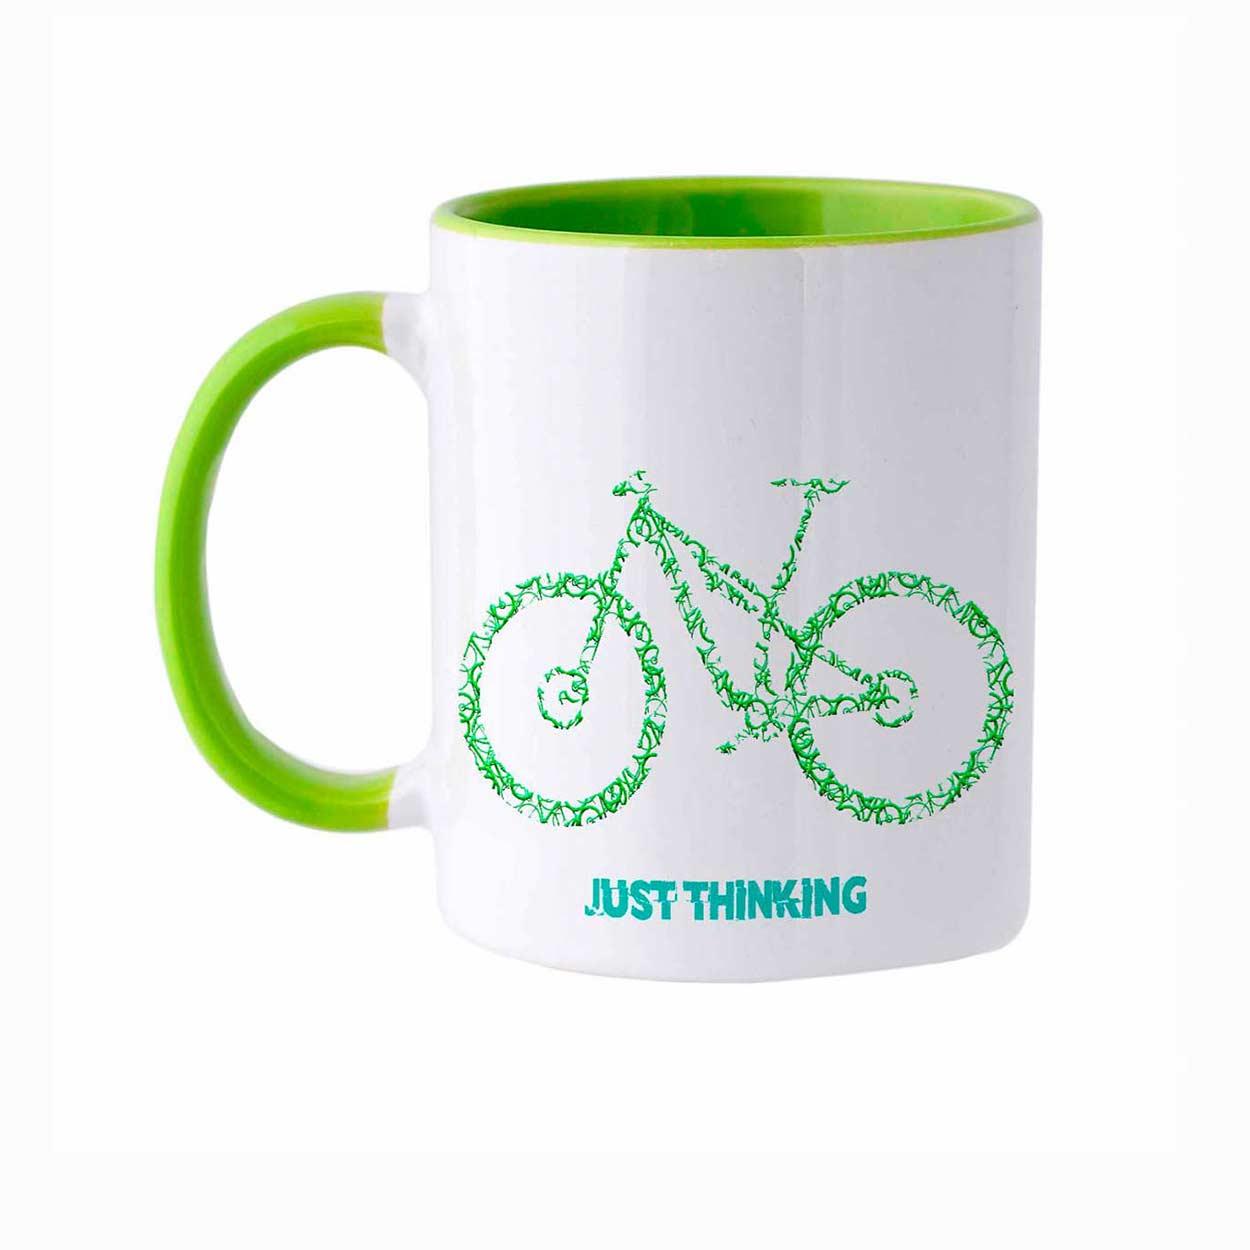 Caneca Thinking Bike